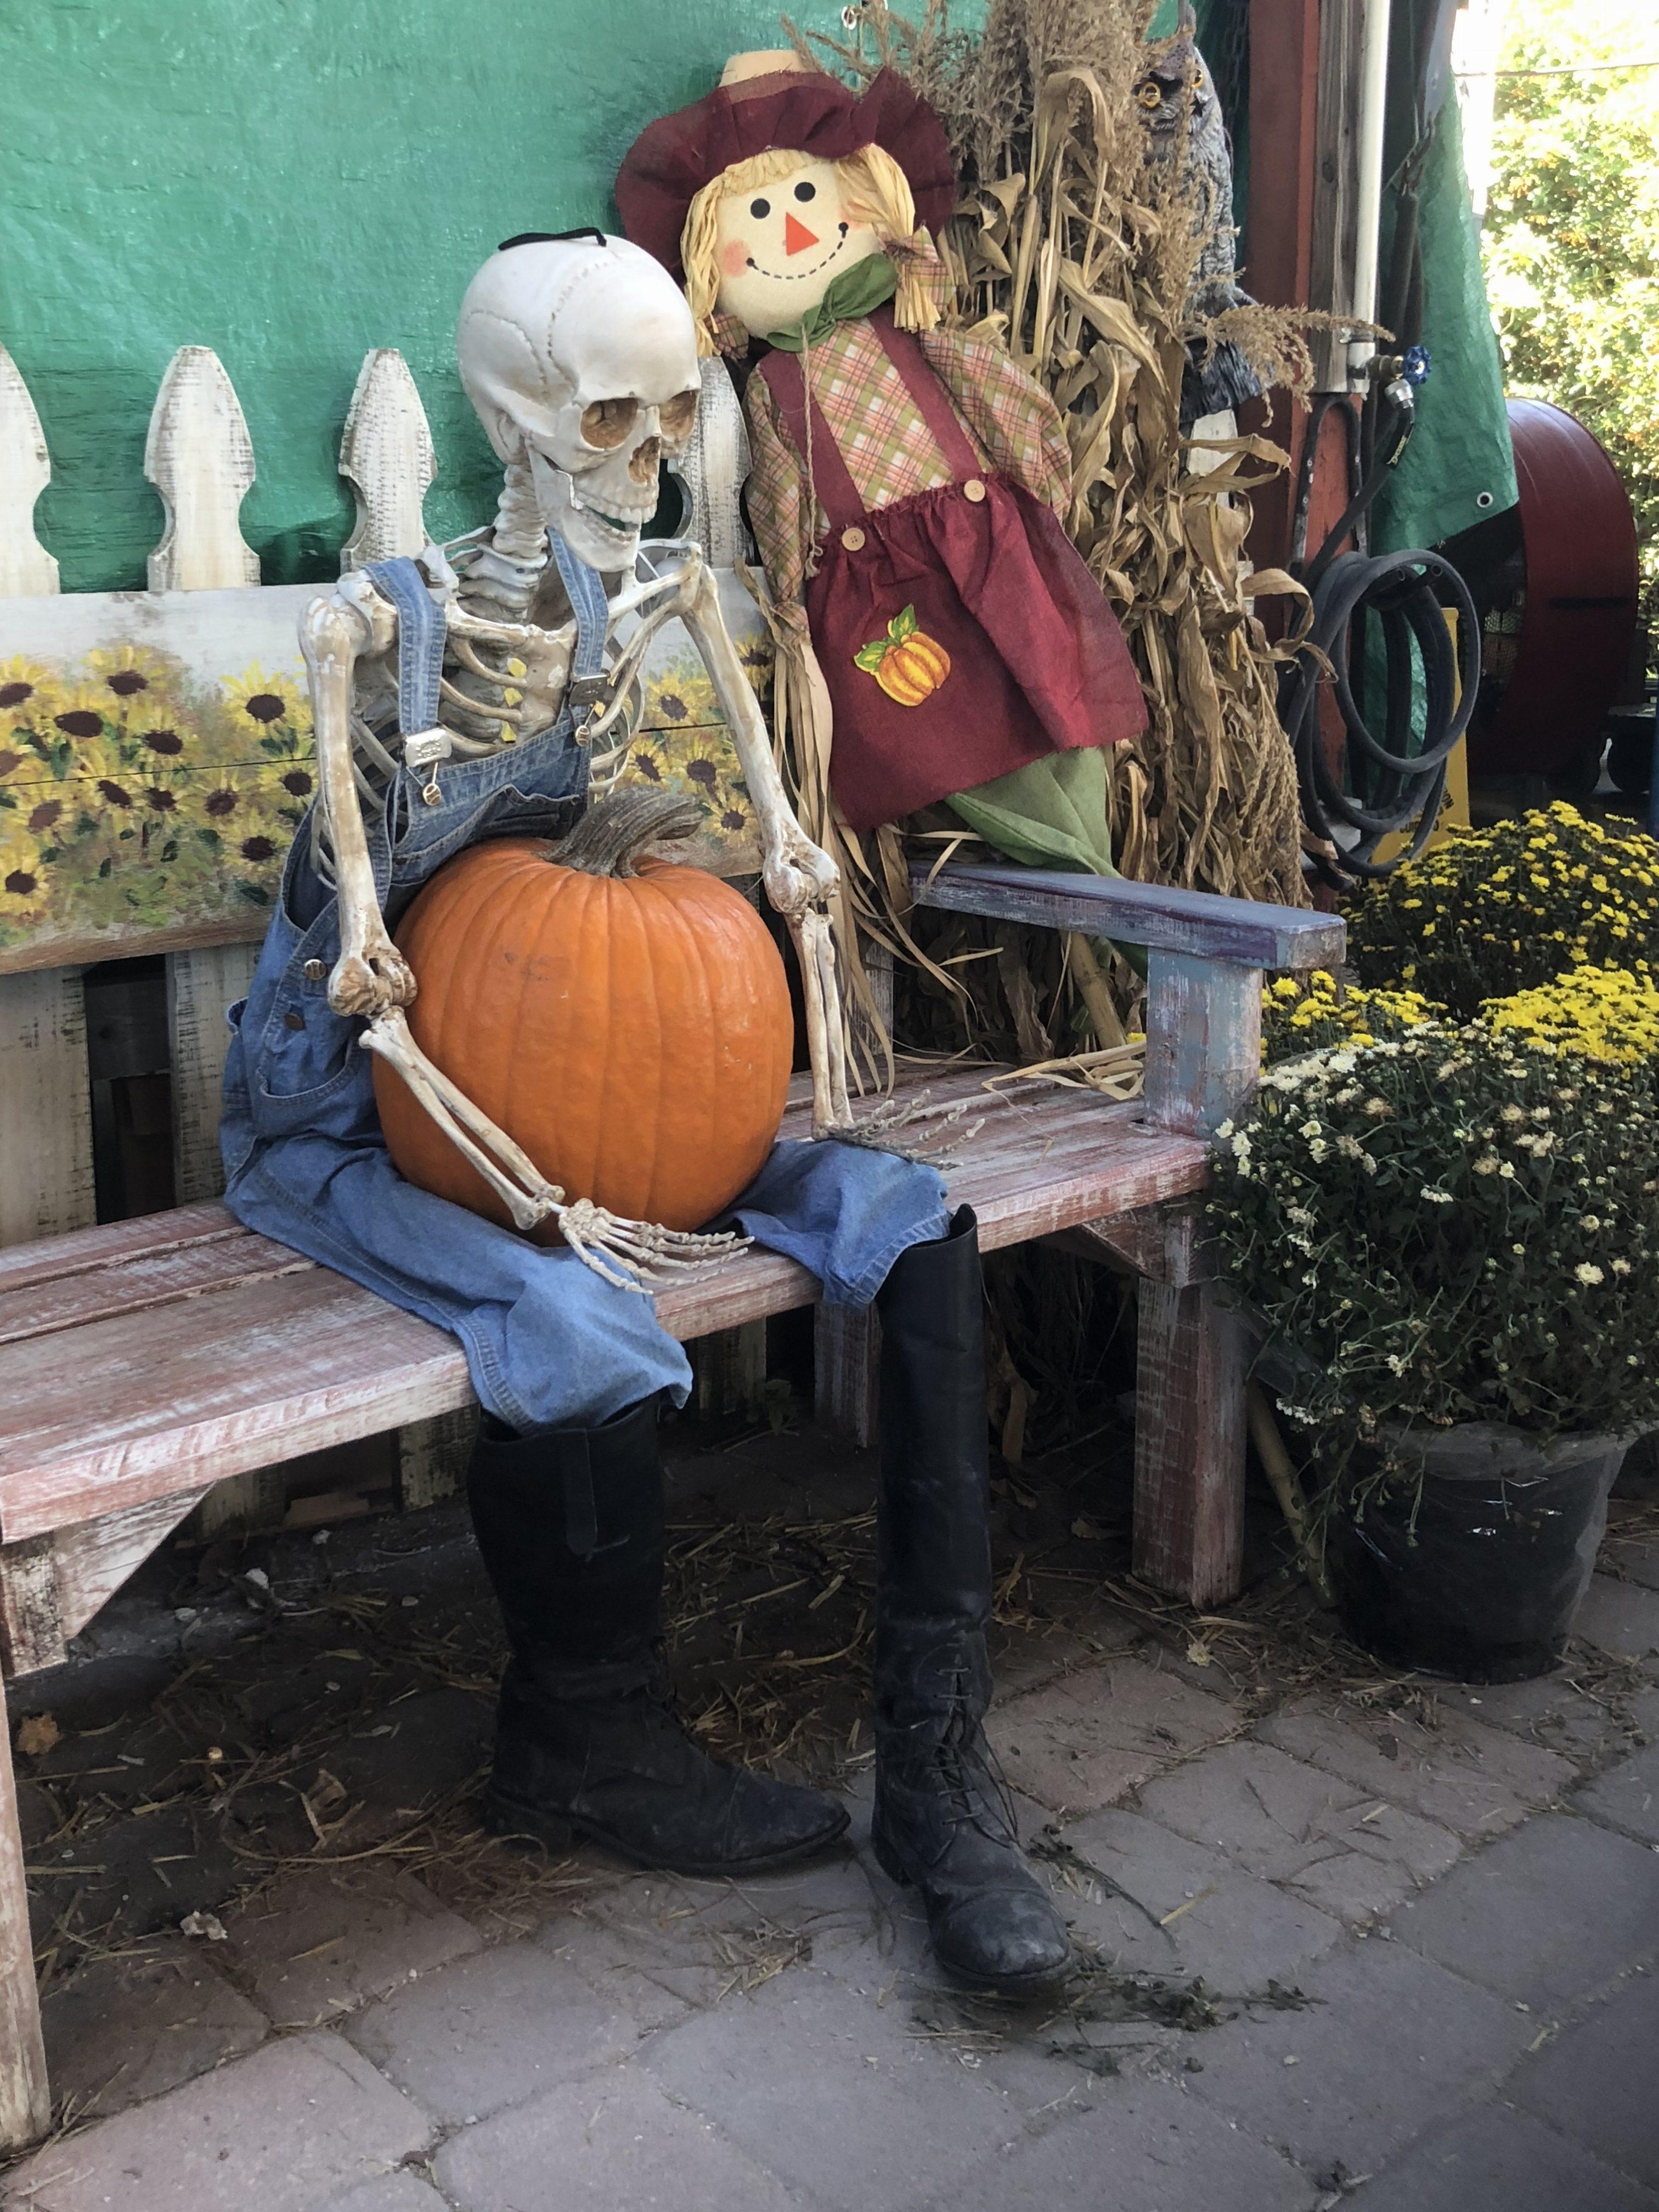 30th Annual Pumpkin Festival sparks fall feelings in SRQ